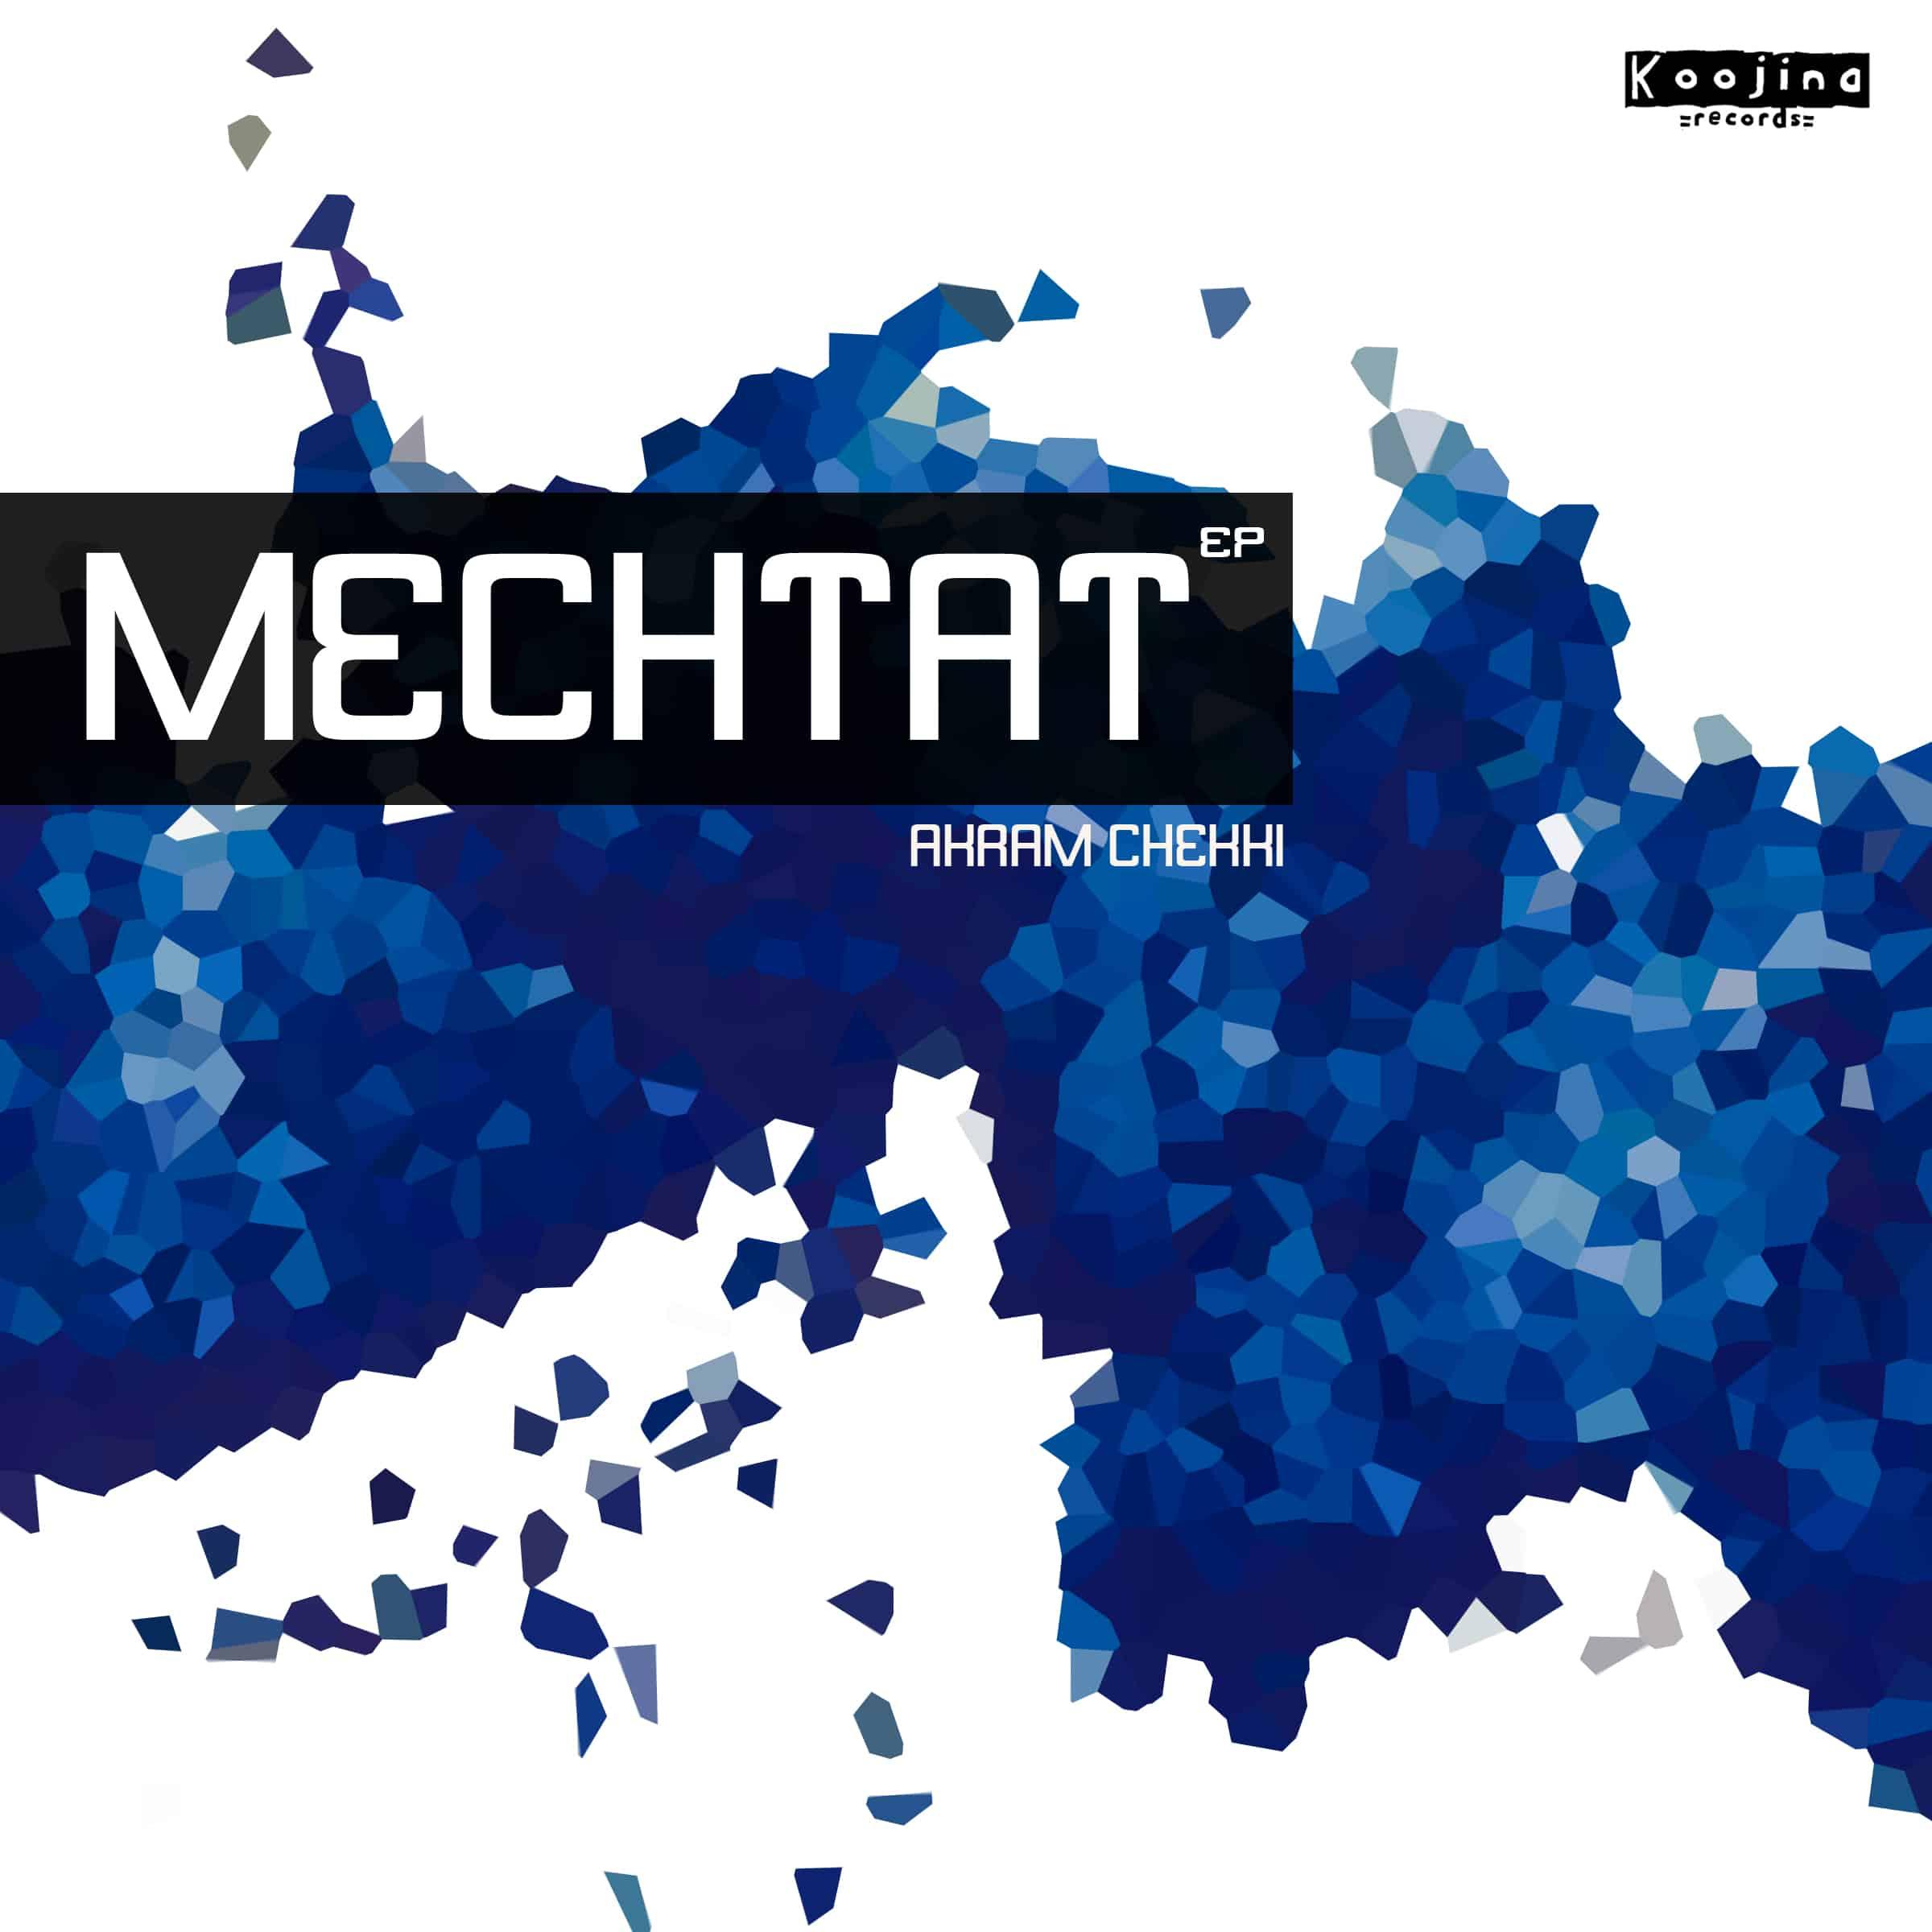 Mechtat ep